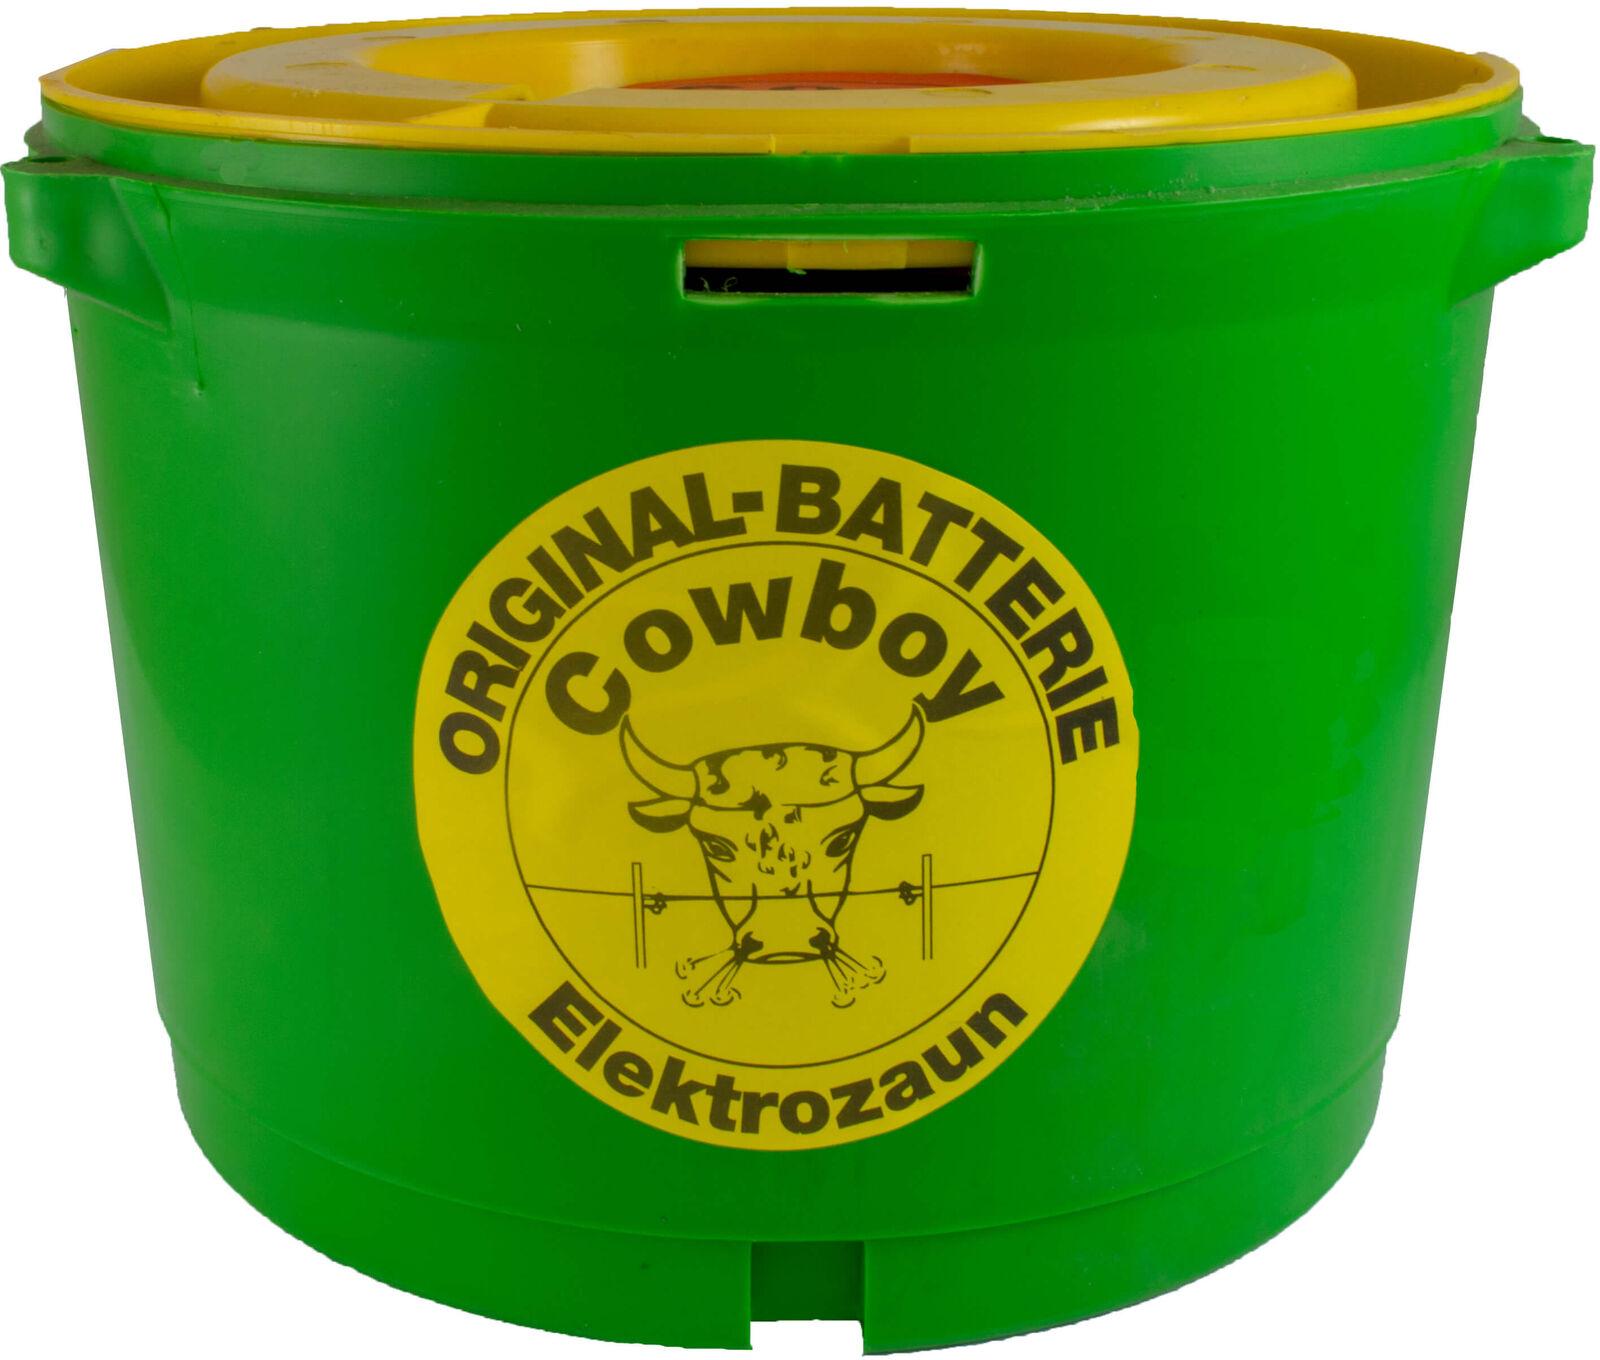 Weidezaunbatterie vaquero 10,5 voltios estándar adecuado para eider b5 bullenschreck